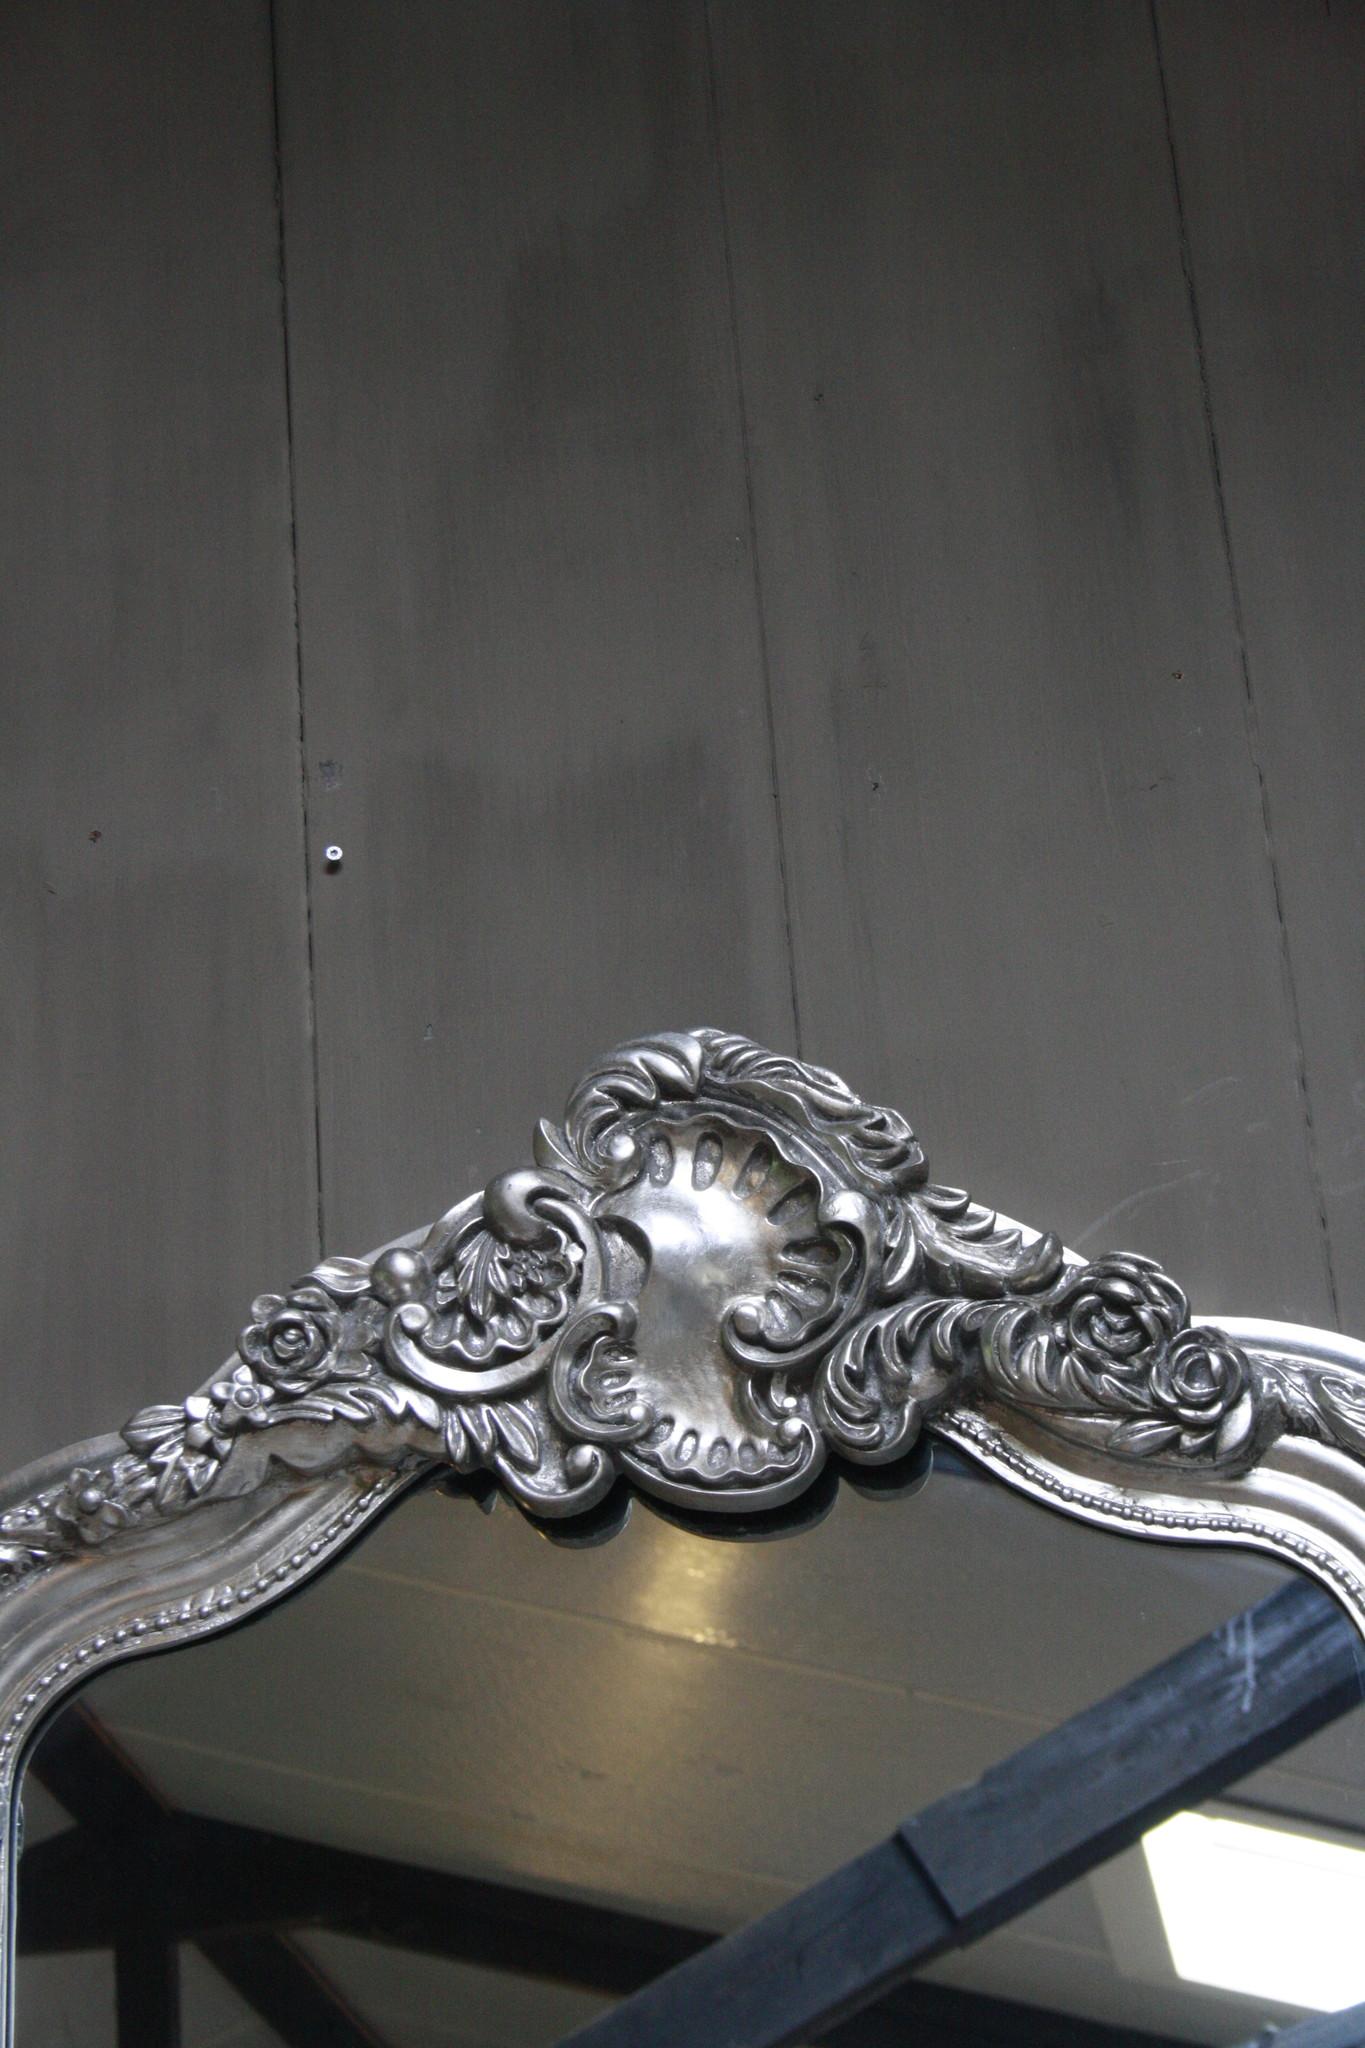 Kuifspiegel Barok Roma Zilver 117 x 80 cm-3